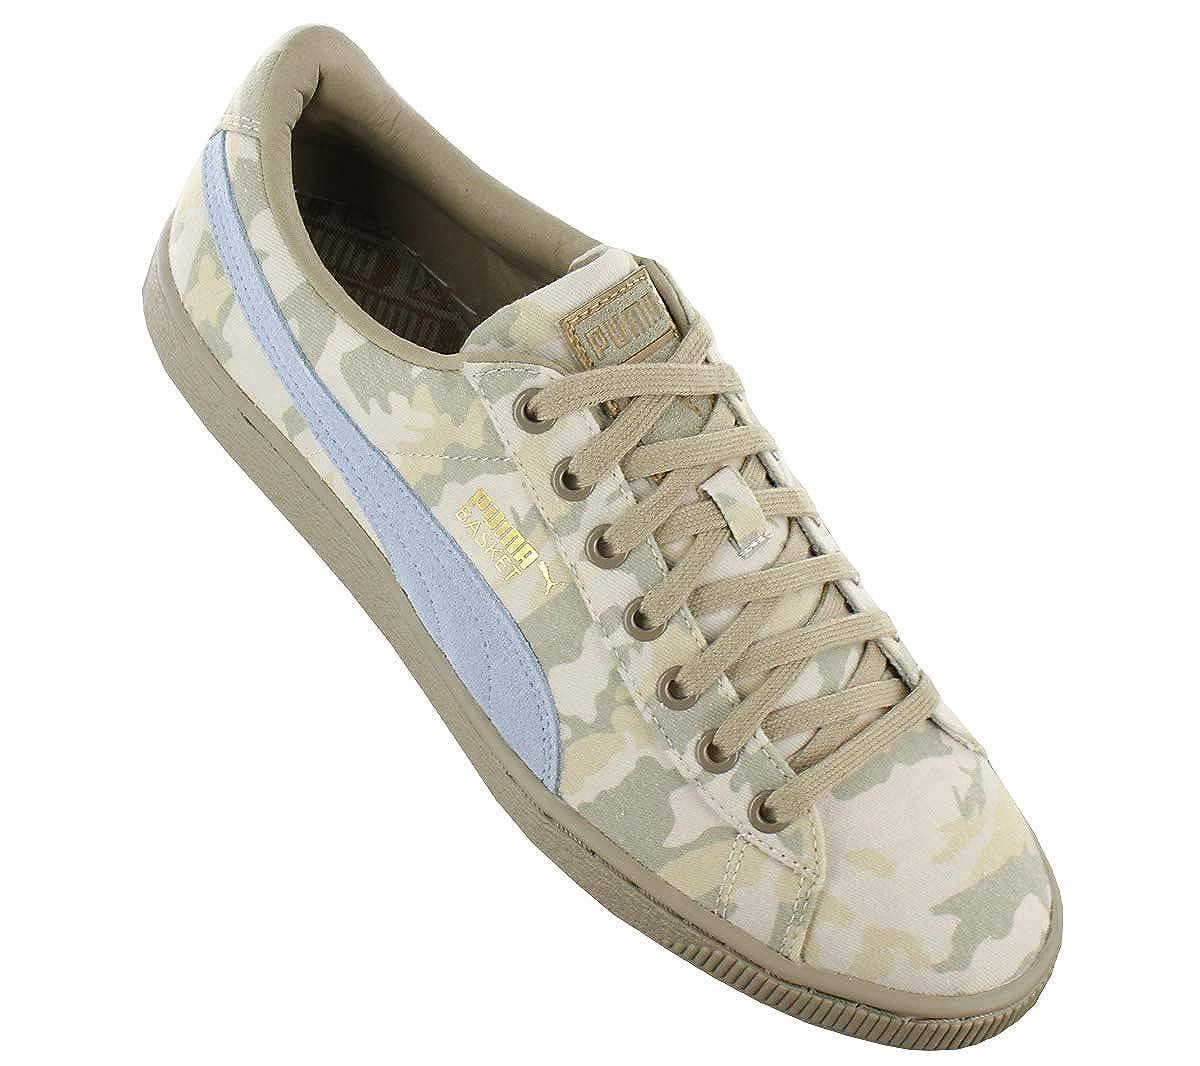 57aad99a55 Puma Basket Classic Camo Herren Schuhe Camouflage Sneaker Turnschuhe:  Amazon.de: Schuhe & Handtaschen